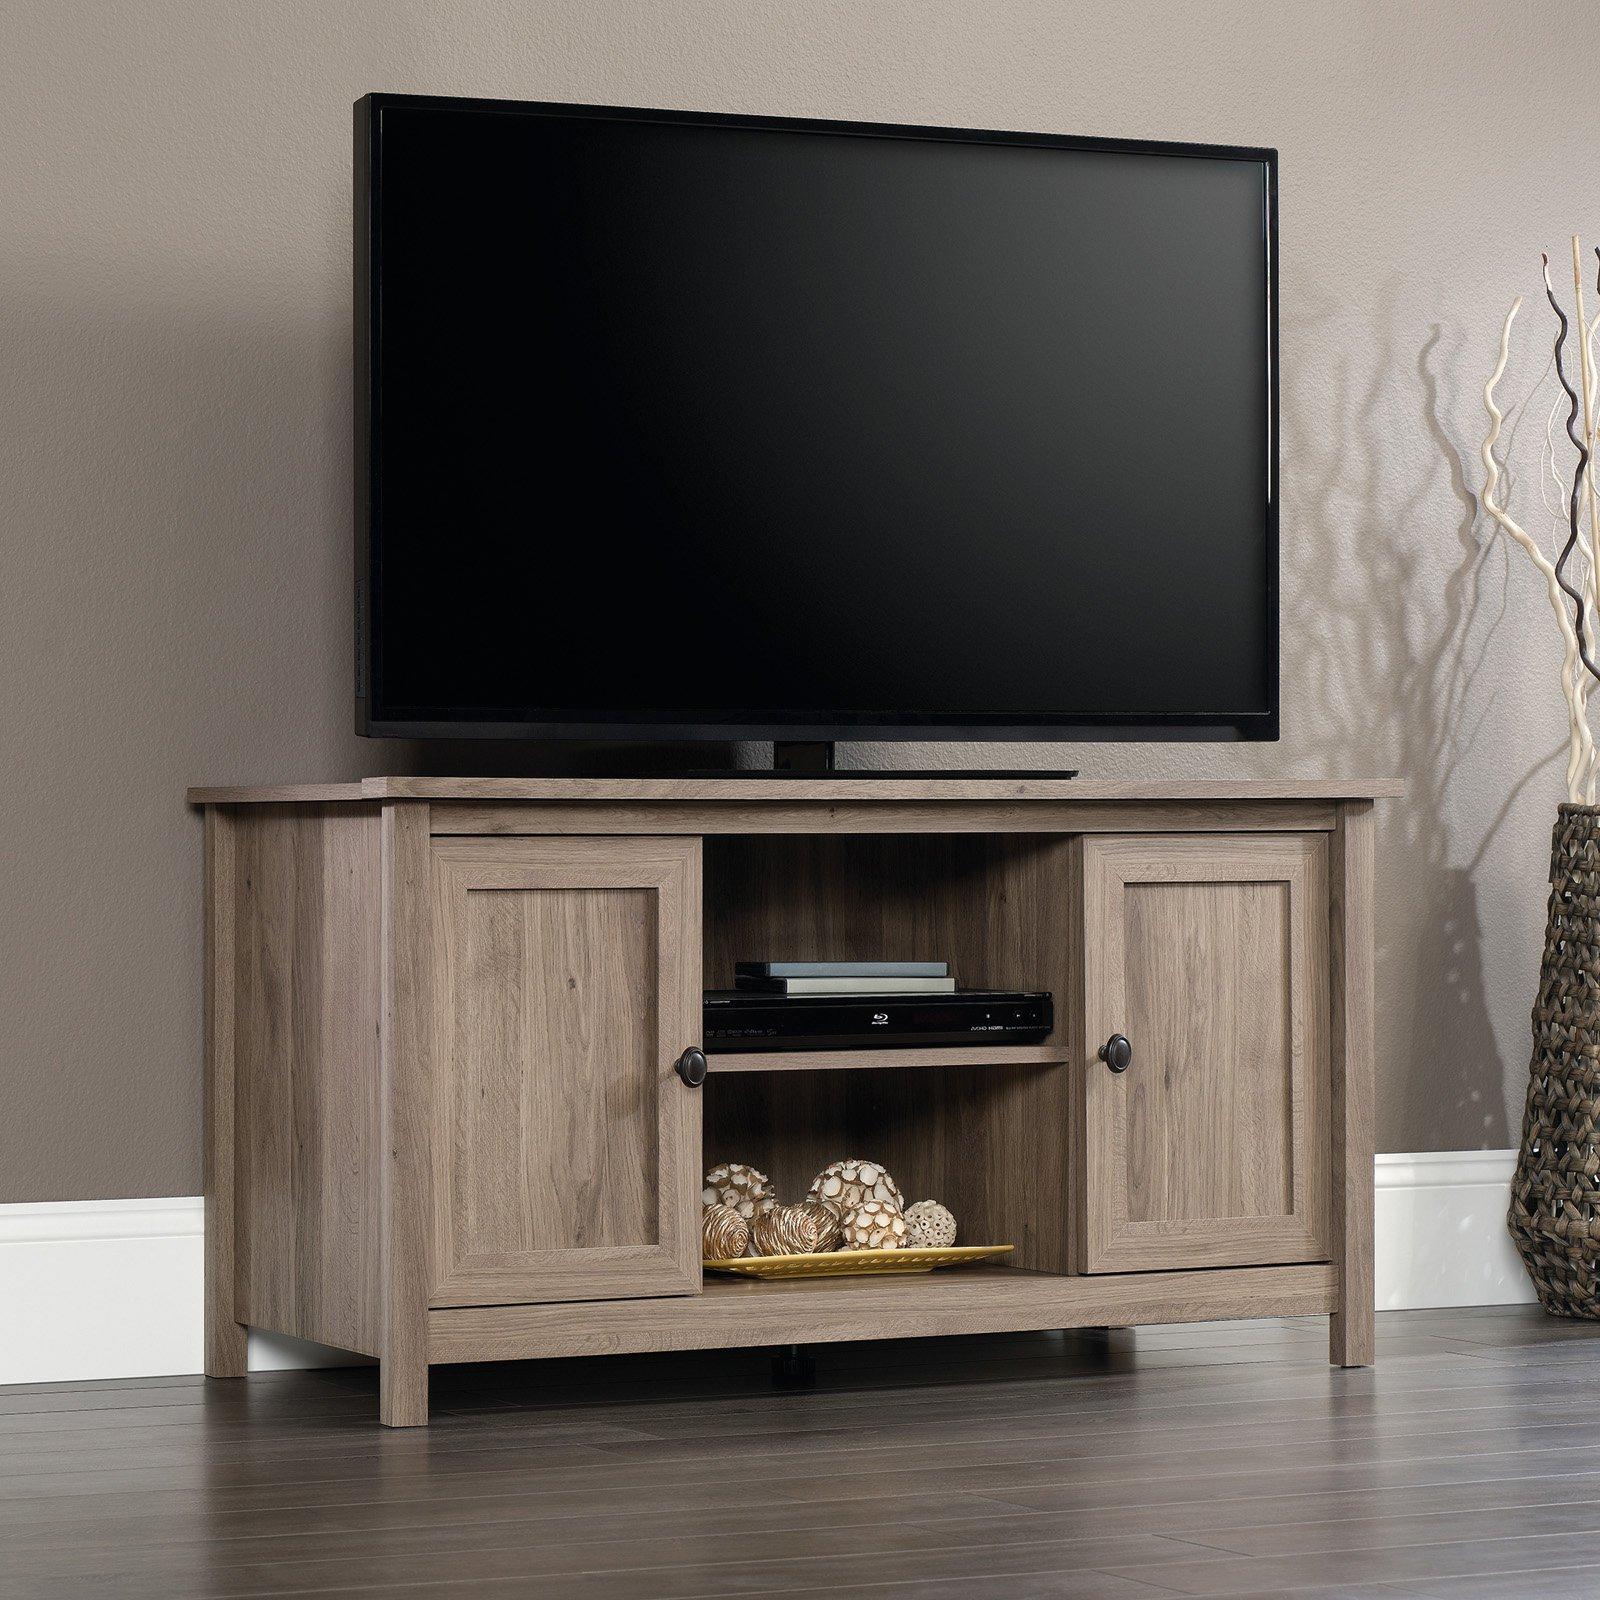 "Sauder County Line Panel TV Stand for TVs up to 47"", Salt Oak Finish"